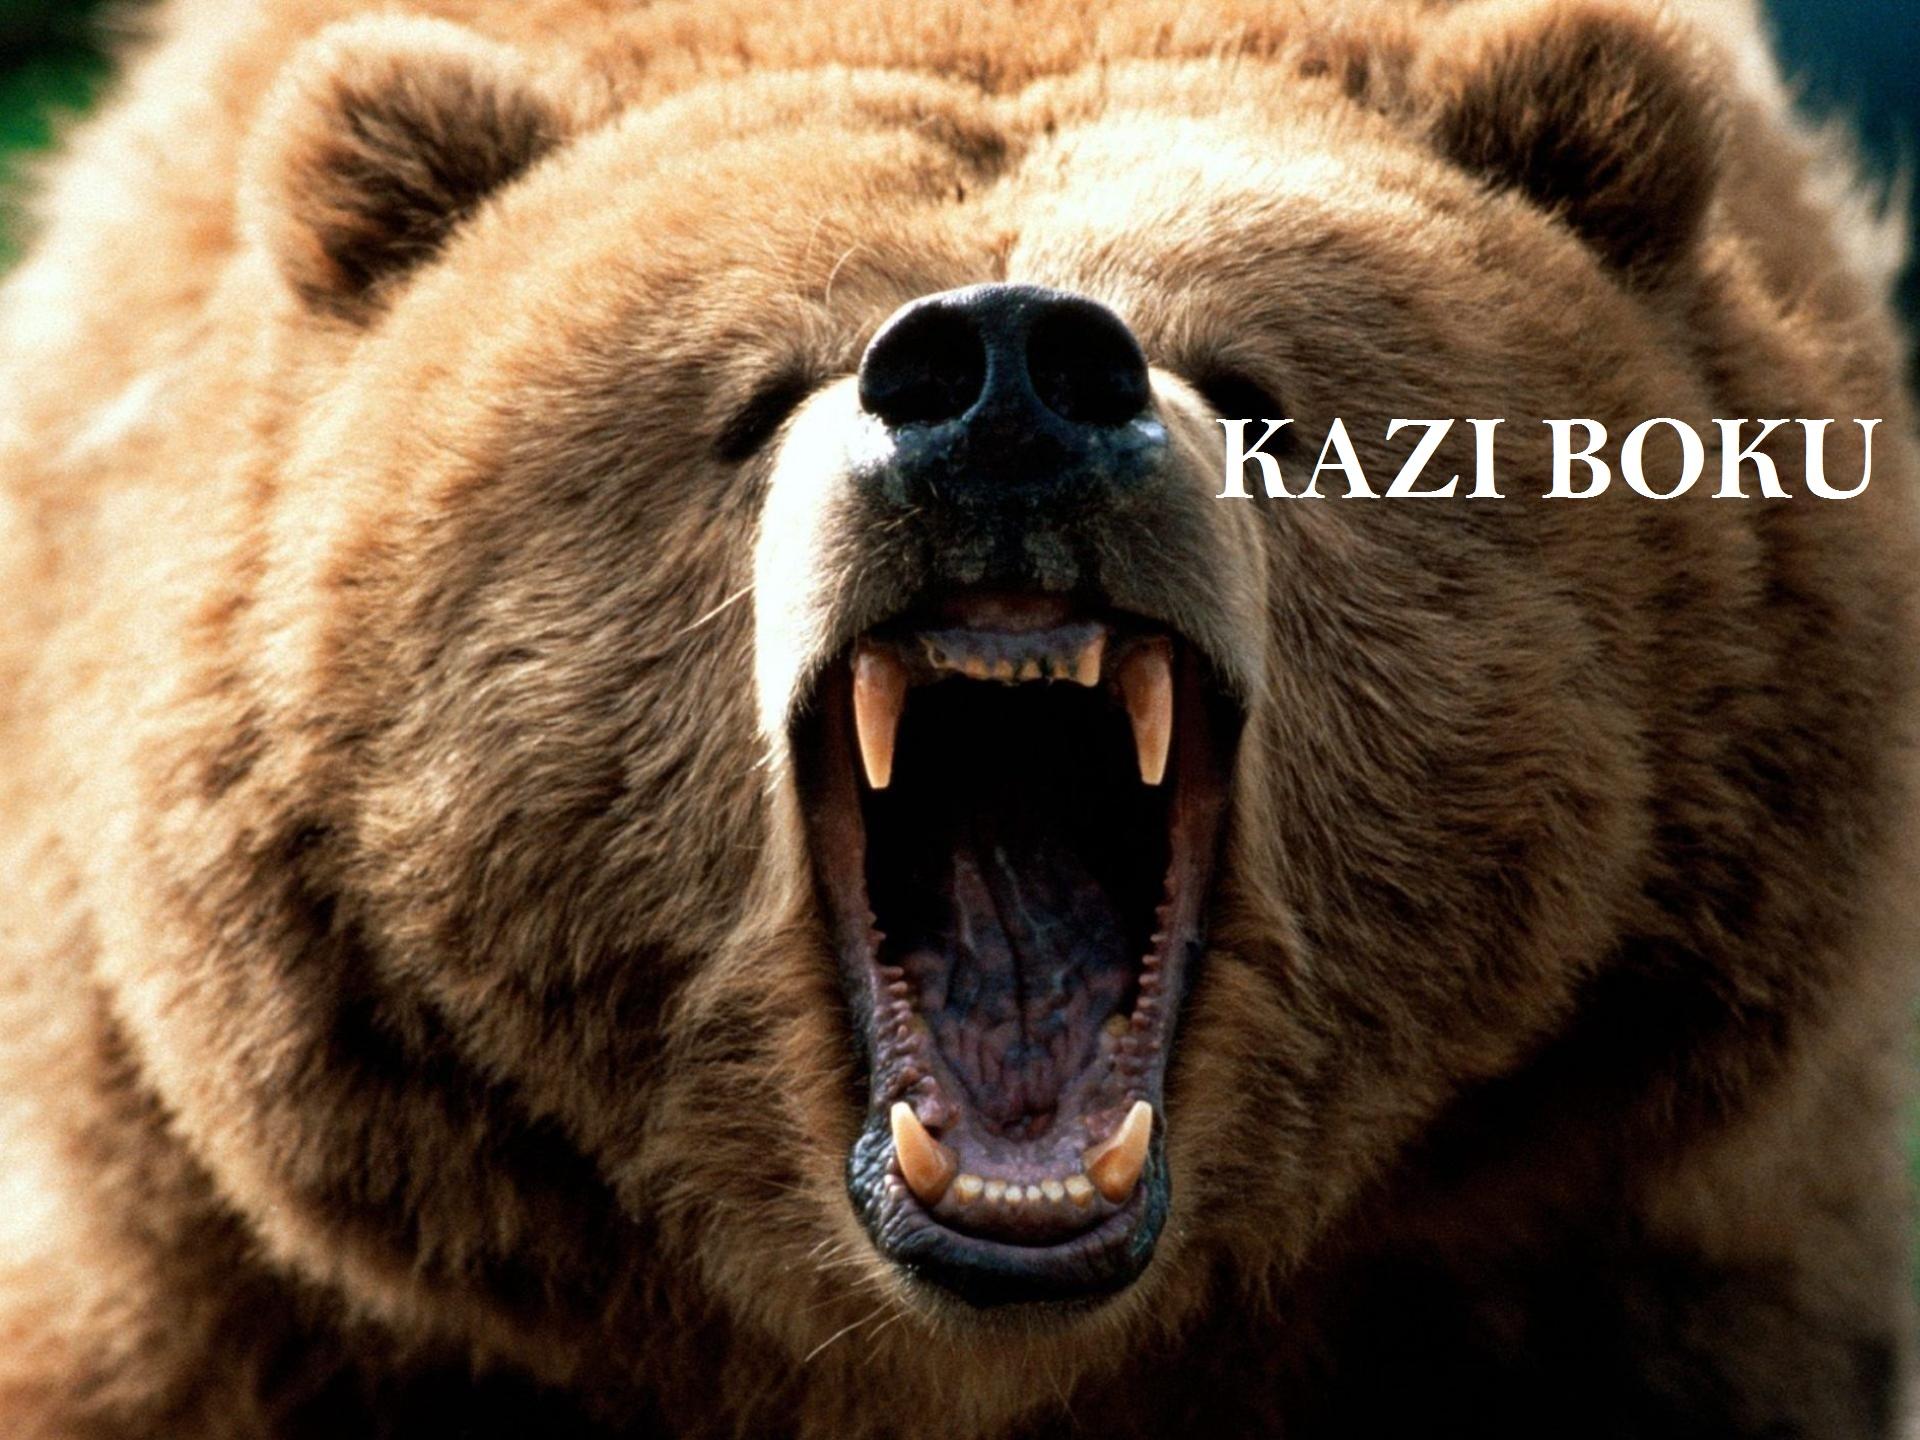 Kazi Boku